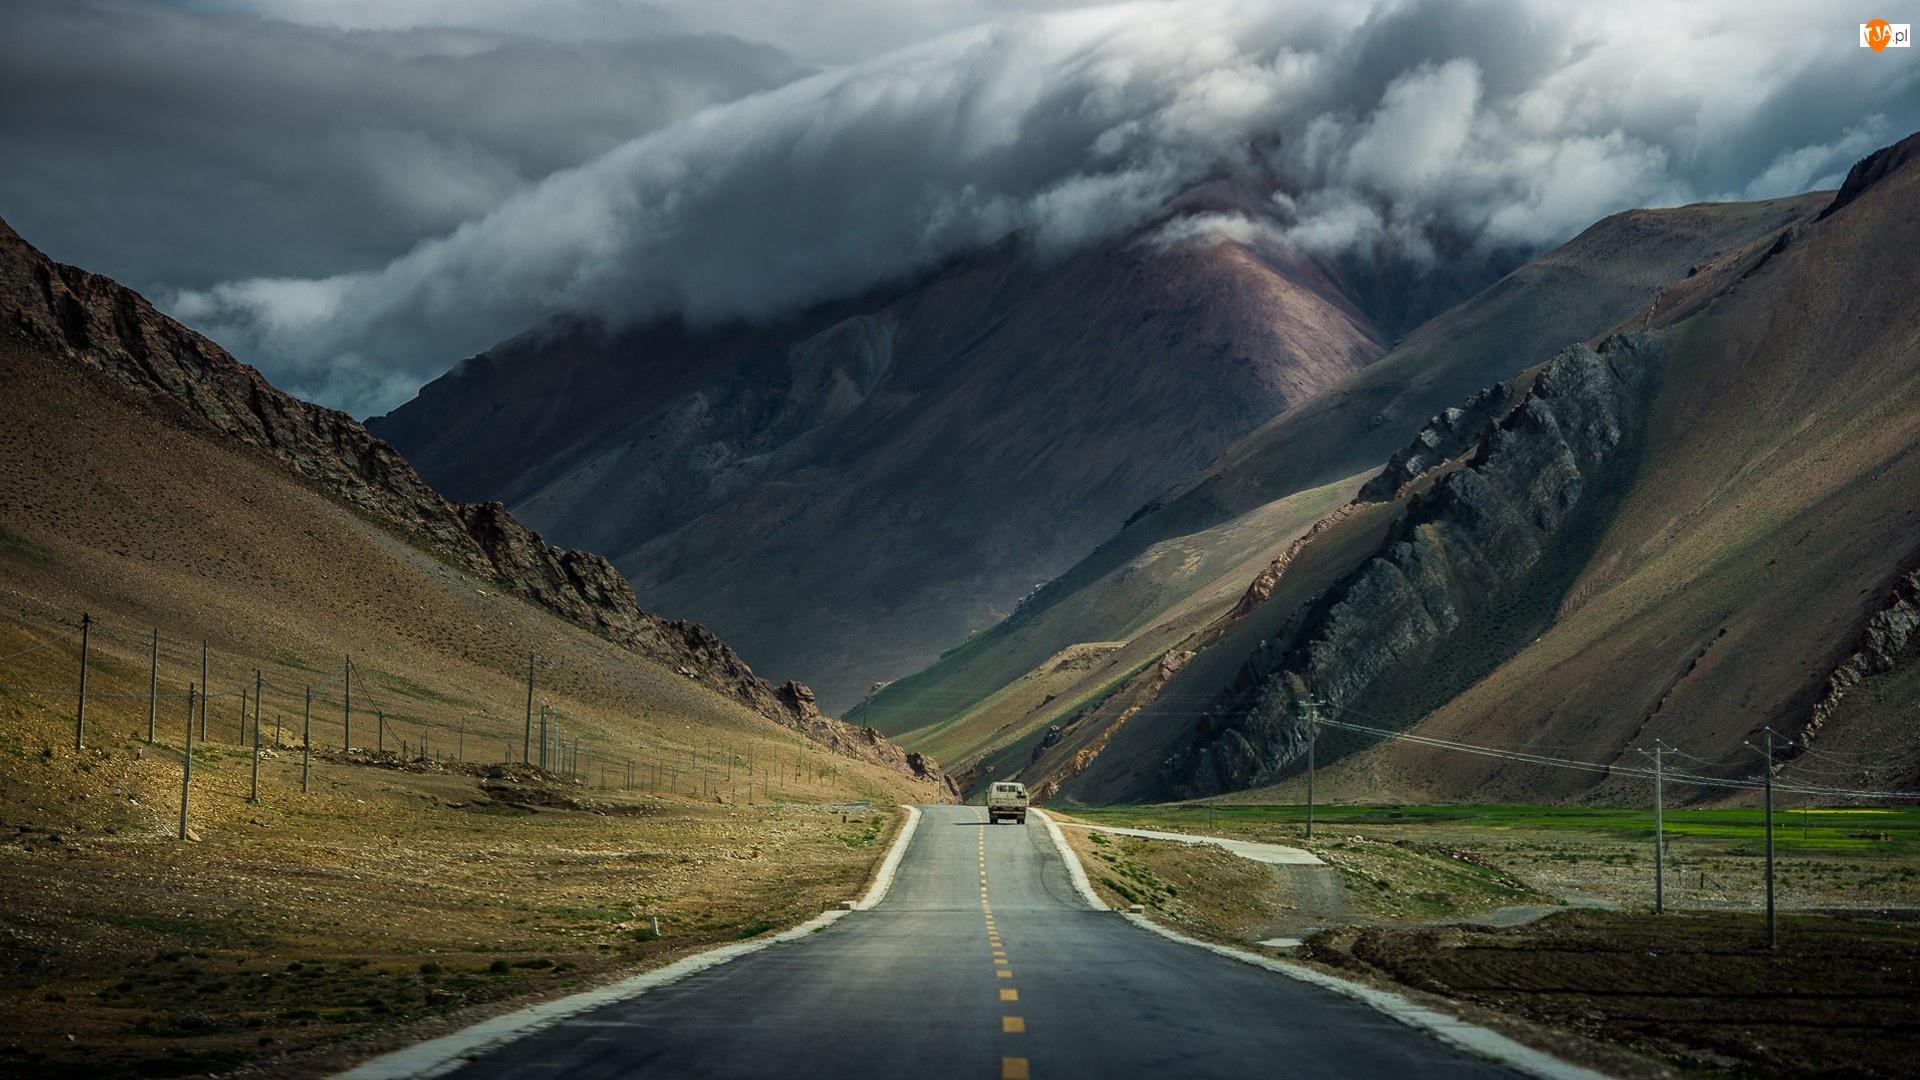 Droga, Chmury, Szczytami, Nad, Gór